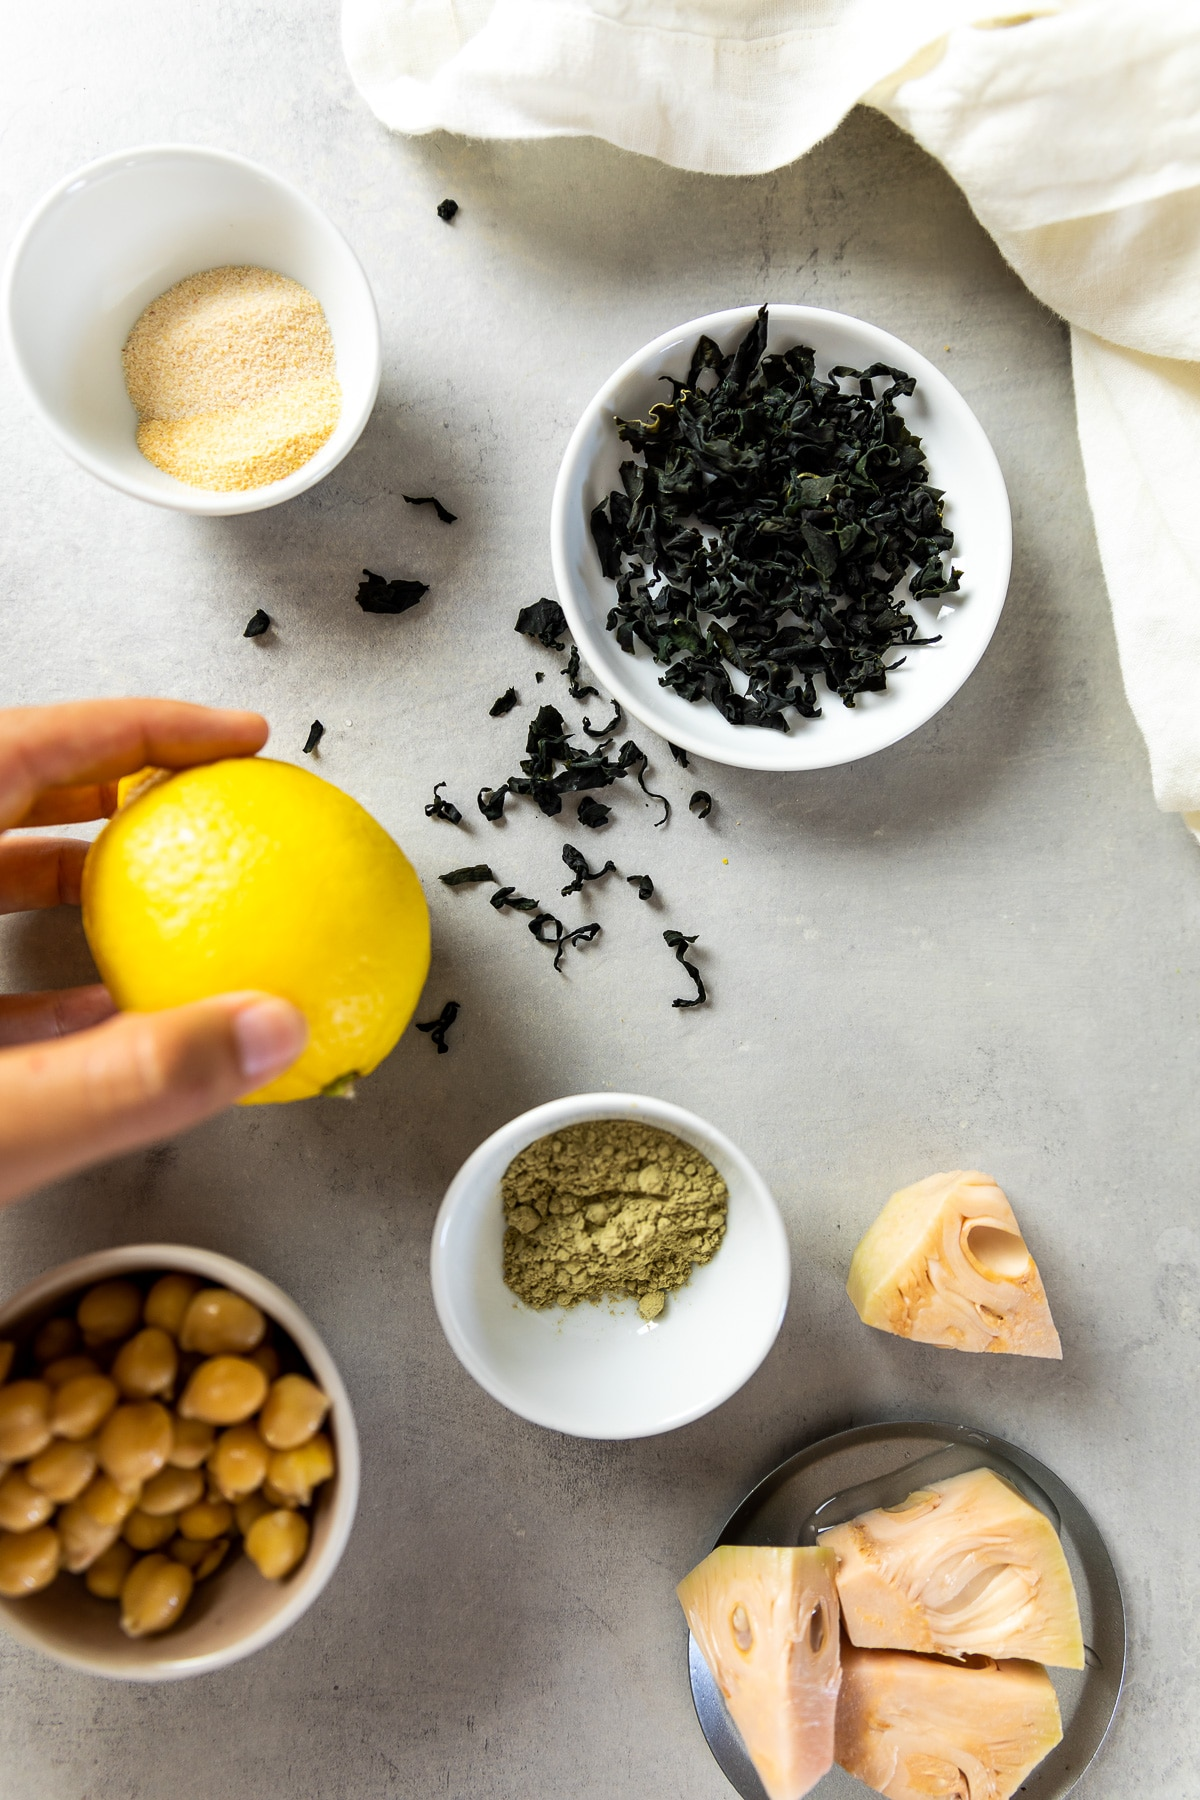 Ingredient shot for the vegan tuna salad sandwich